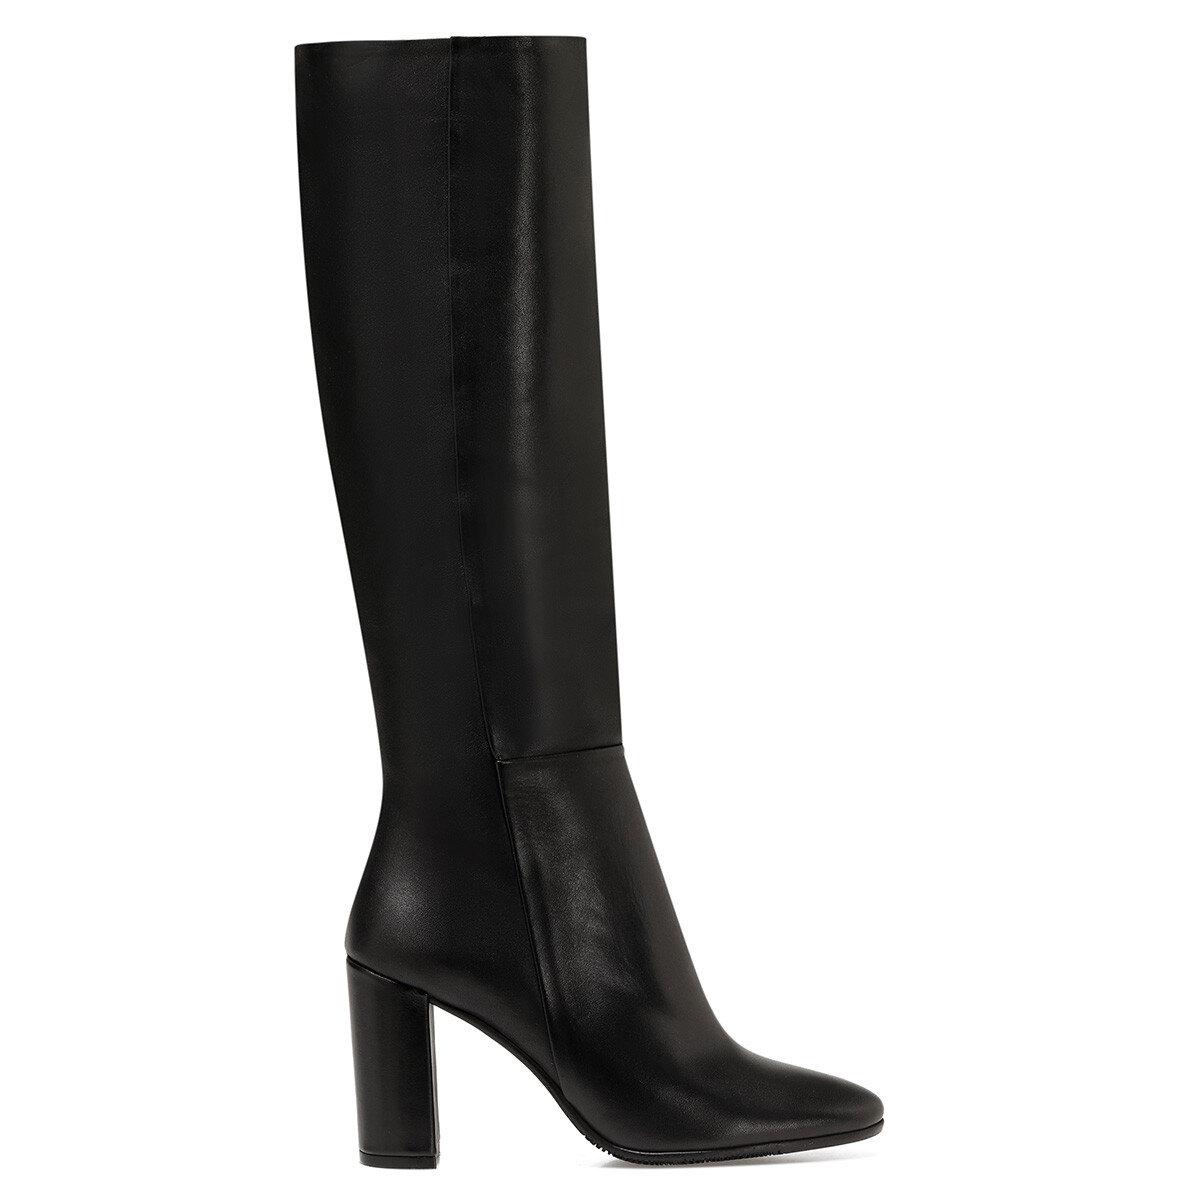 PRILLI Siyah Kadın Topuklu Çizme